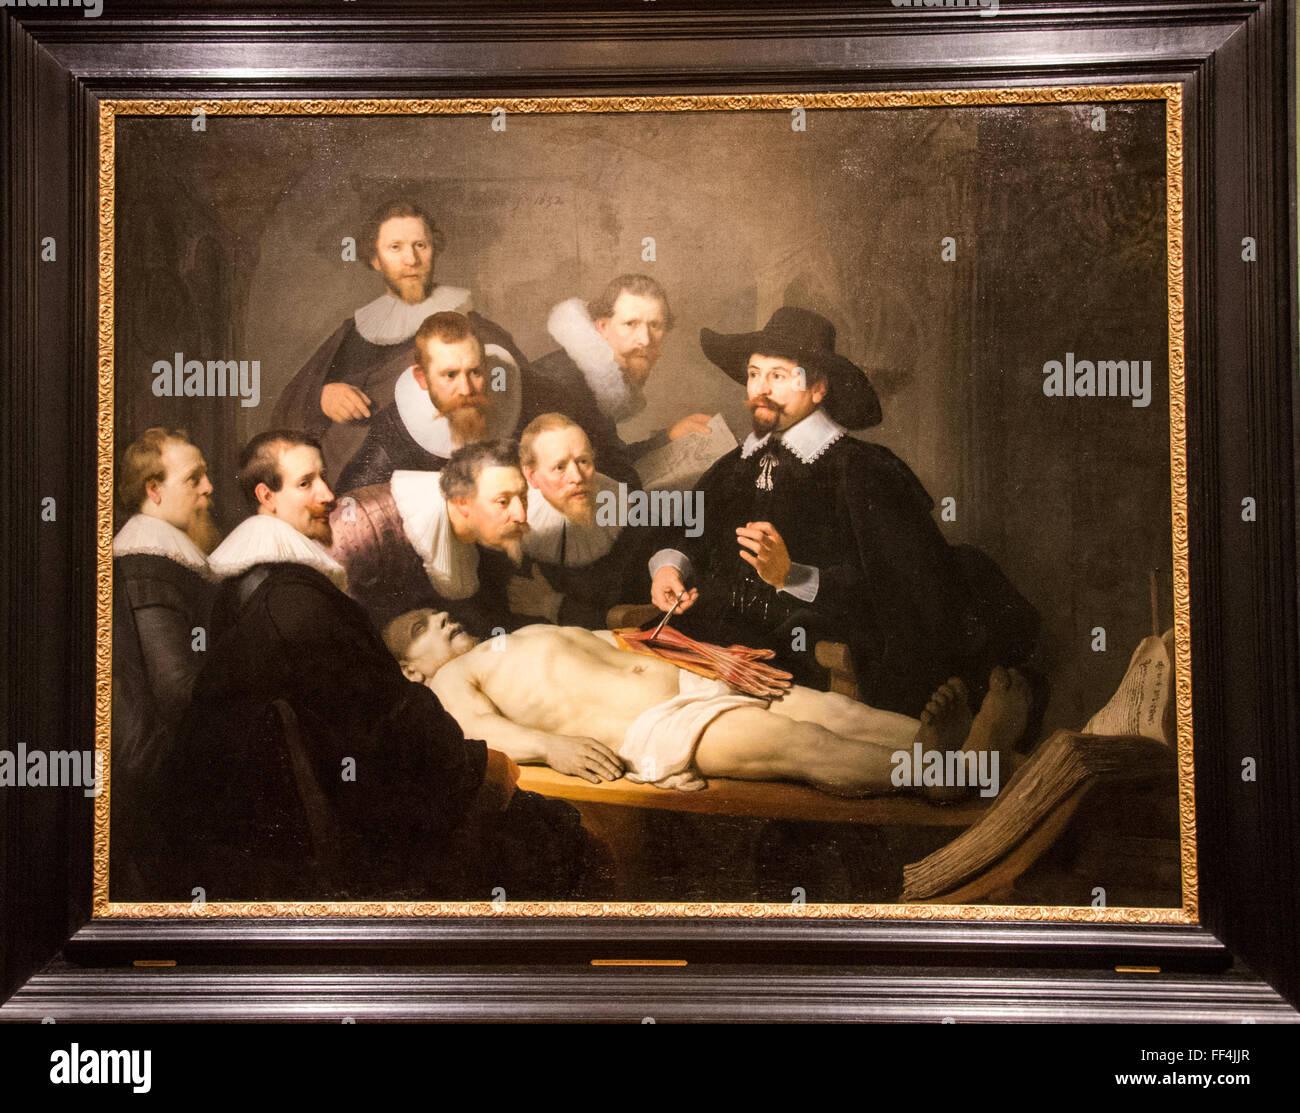 anatomy lesson dr tulp rembrandt Stock Photo: 95374127 - Alamy